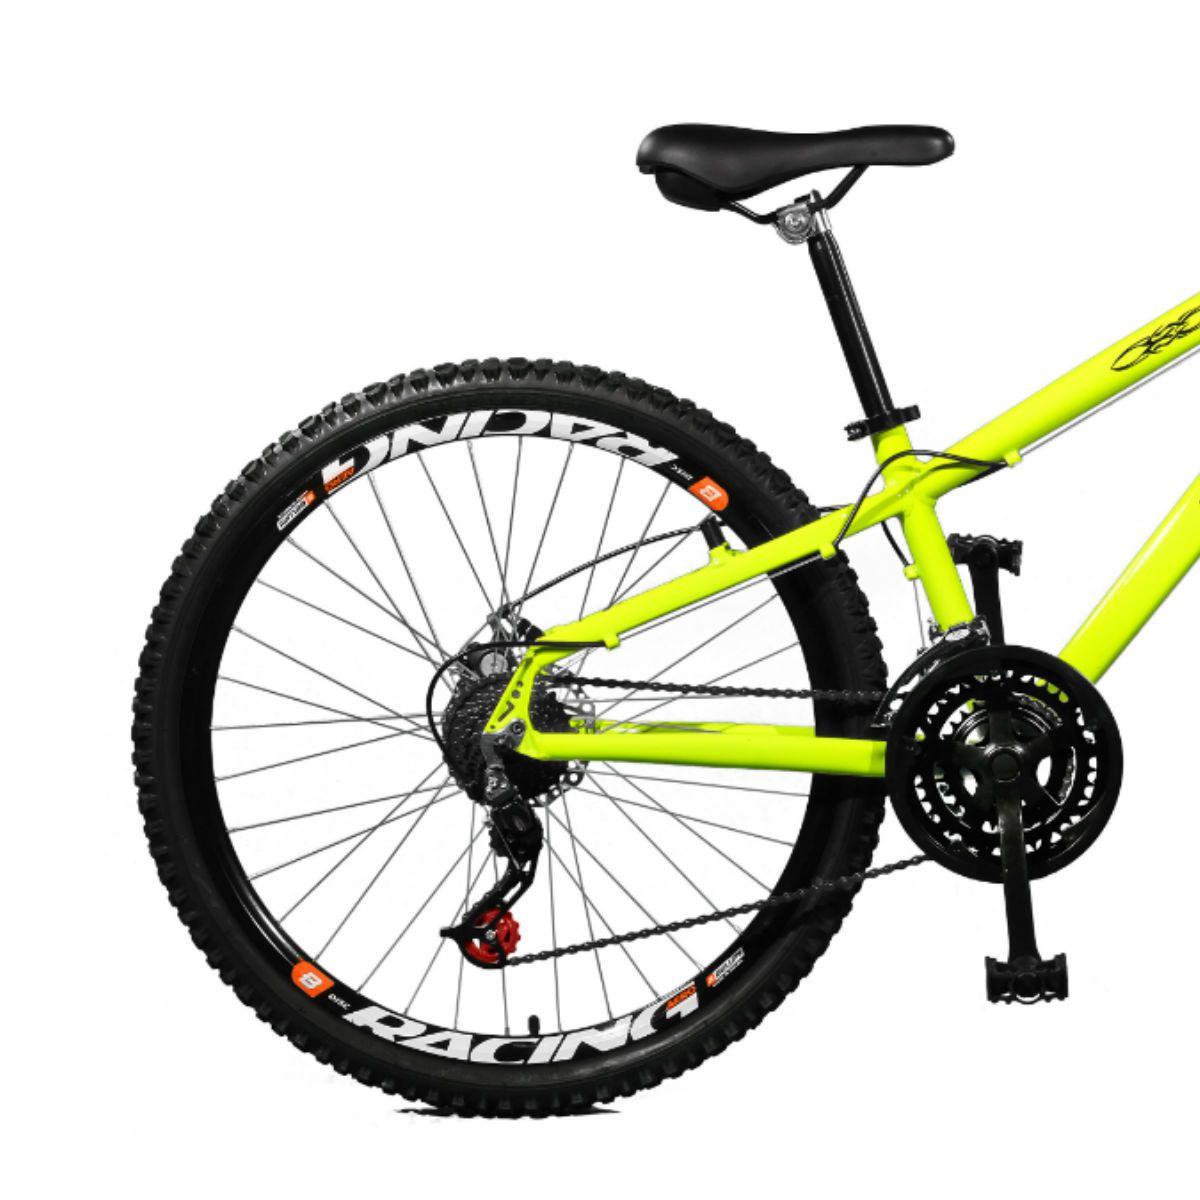 Bicicleta Master Bike Aro 26 Free Rider Freio à Disco A-36 21 V  Amarelo Neon